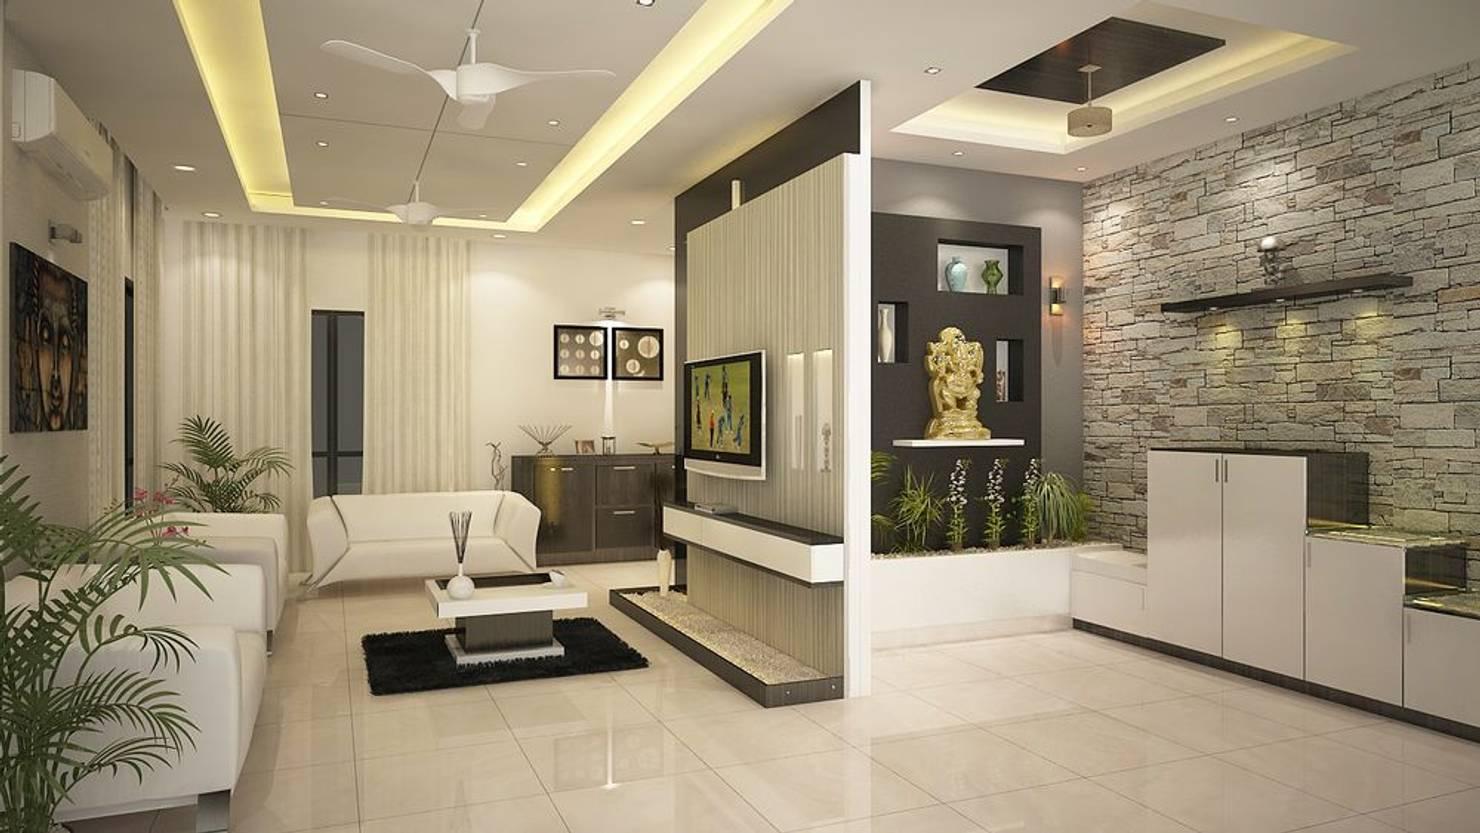 A unique 4 bedroom Bangalore home